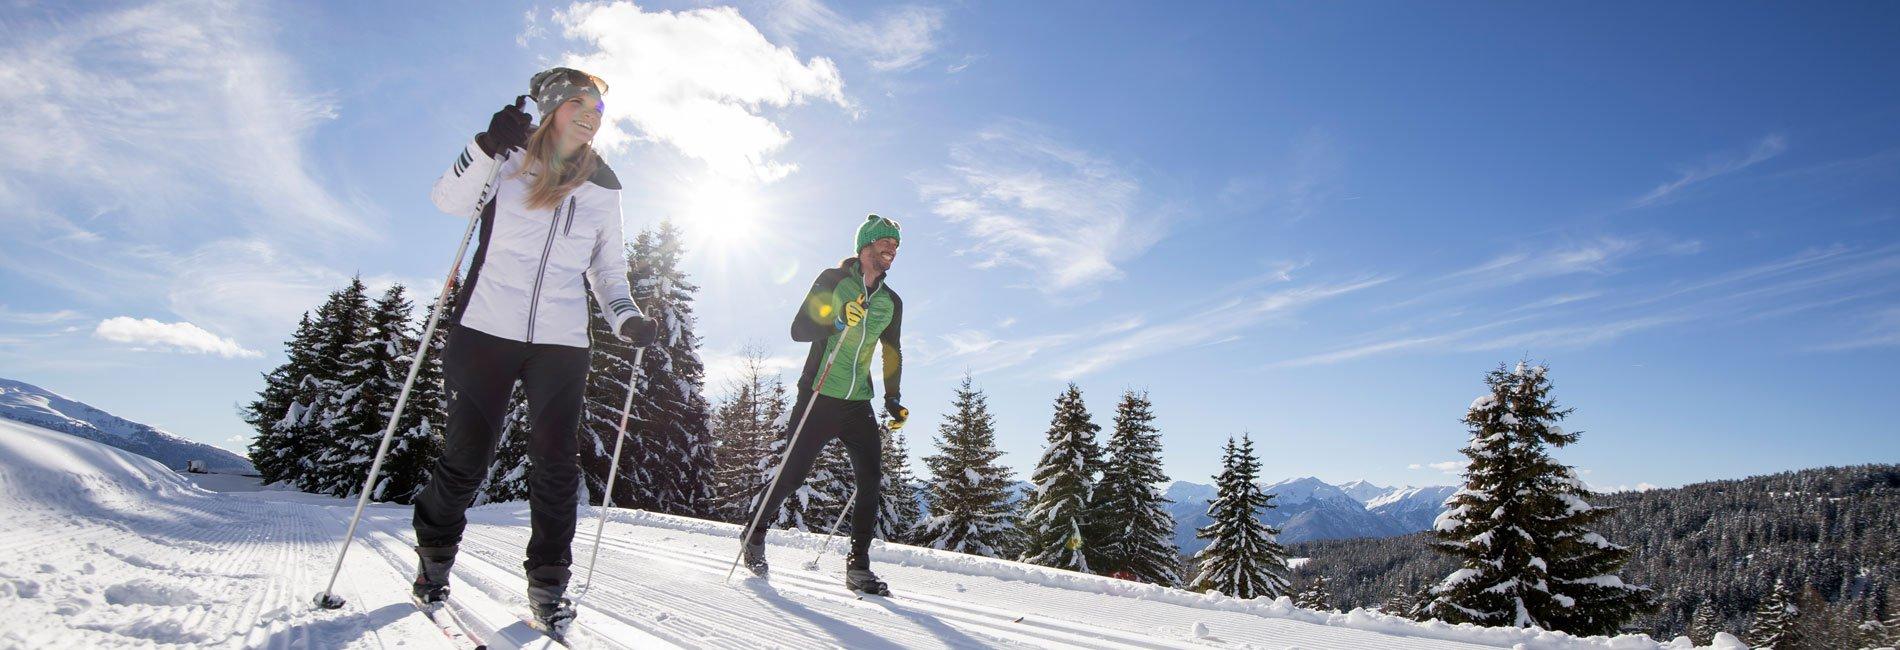 skiurlaub-meransen-09